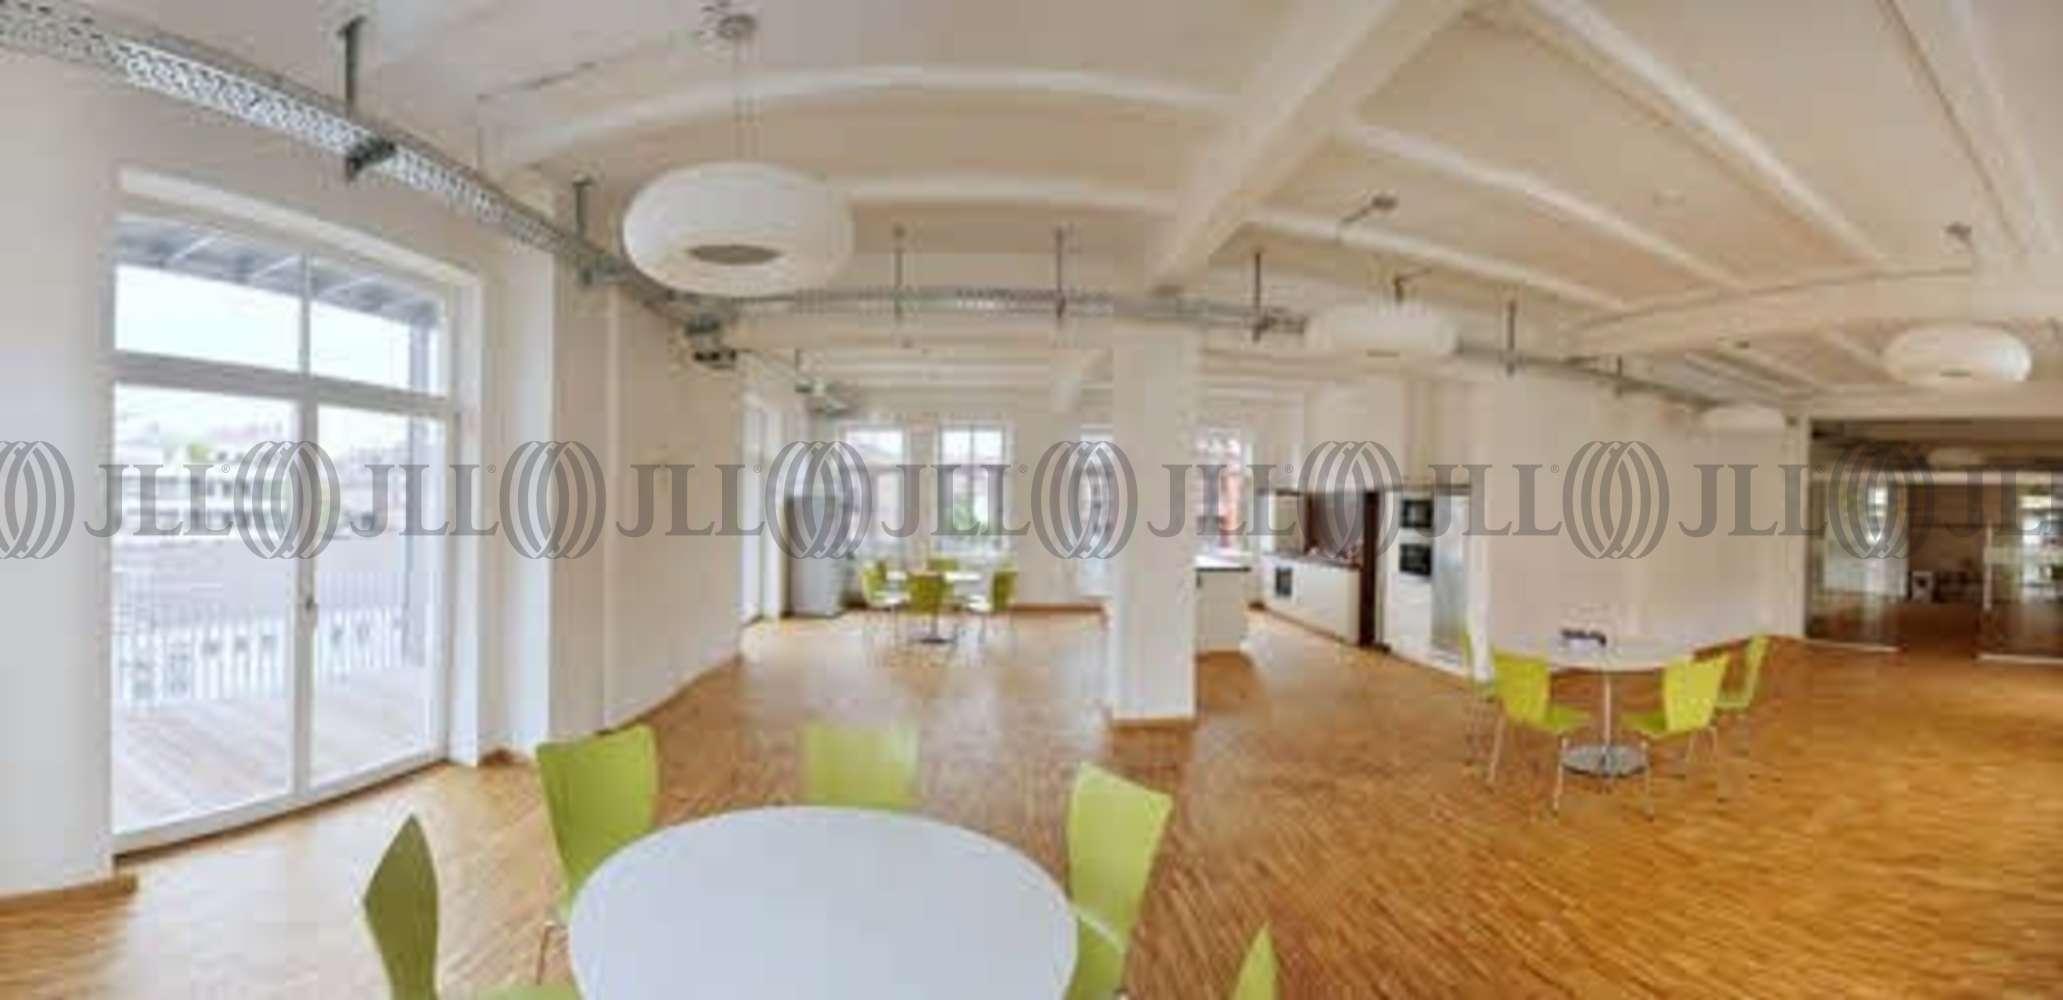 Büros Nürnberg, 90419 - Büro - Nürnberg, St Johannis - M1192 - 10604796